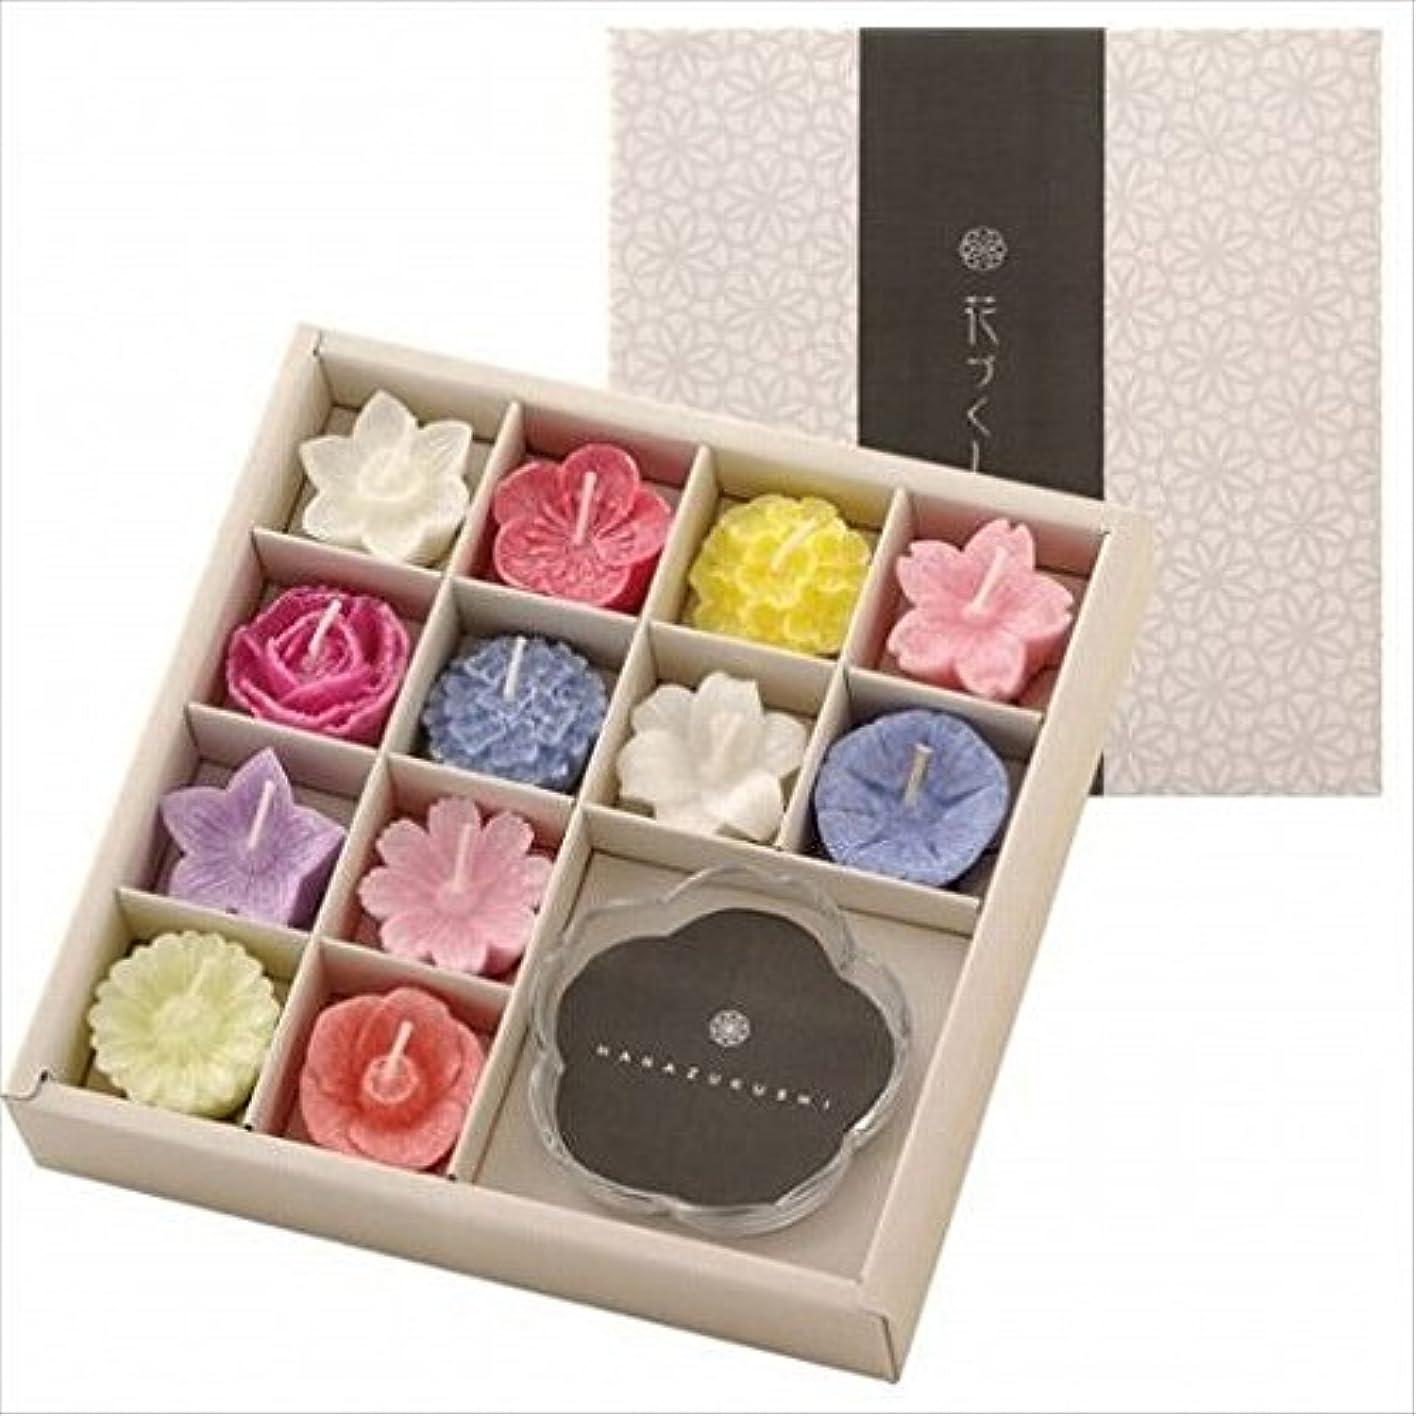 kameyama candle(カメヤマキャンドル) 花づくしギフトセット(植物性) キャンドル(96200700)